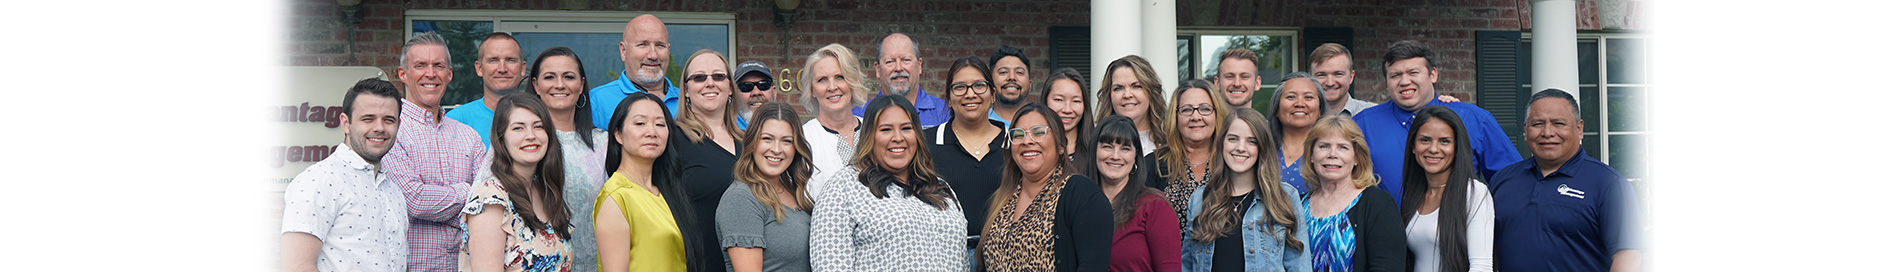 Advantage Management Staff Group Photo